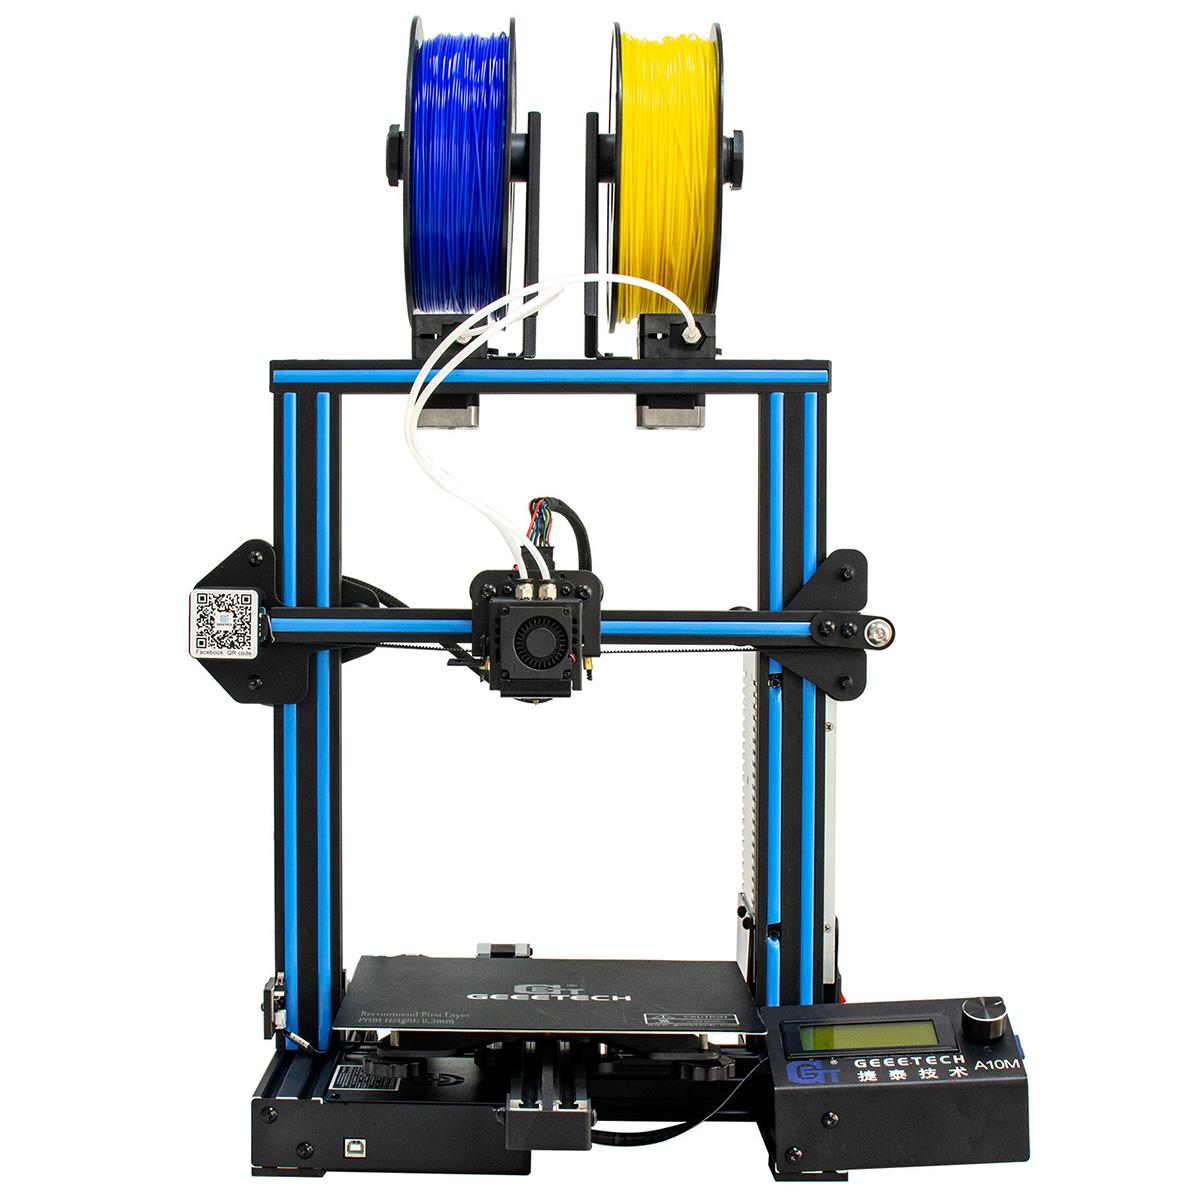 Geeetech Acrylic Prusa I3 Pro C Dual Extruder MK8 3D Printer LCD2004 US Seller